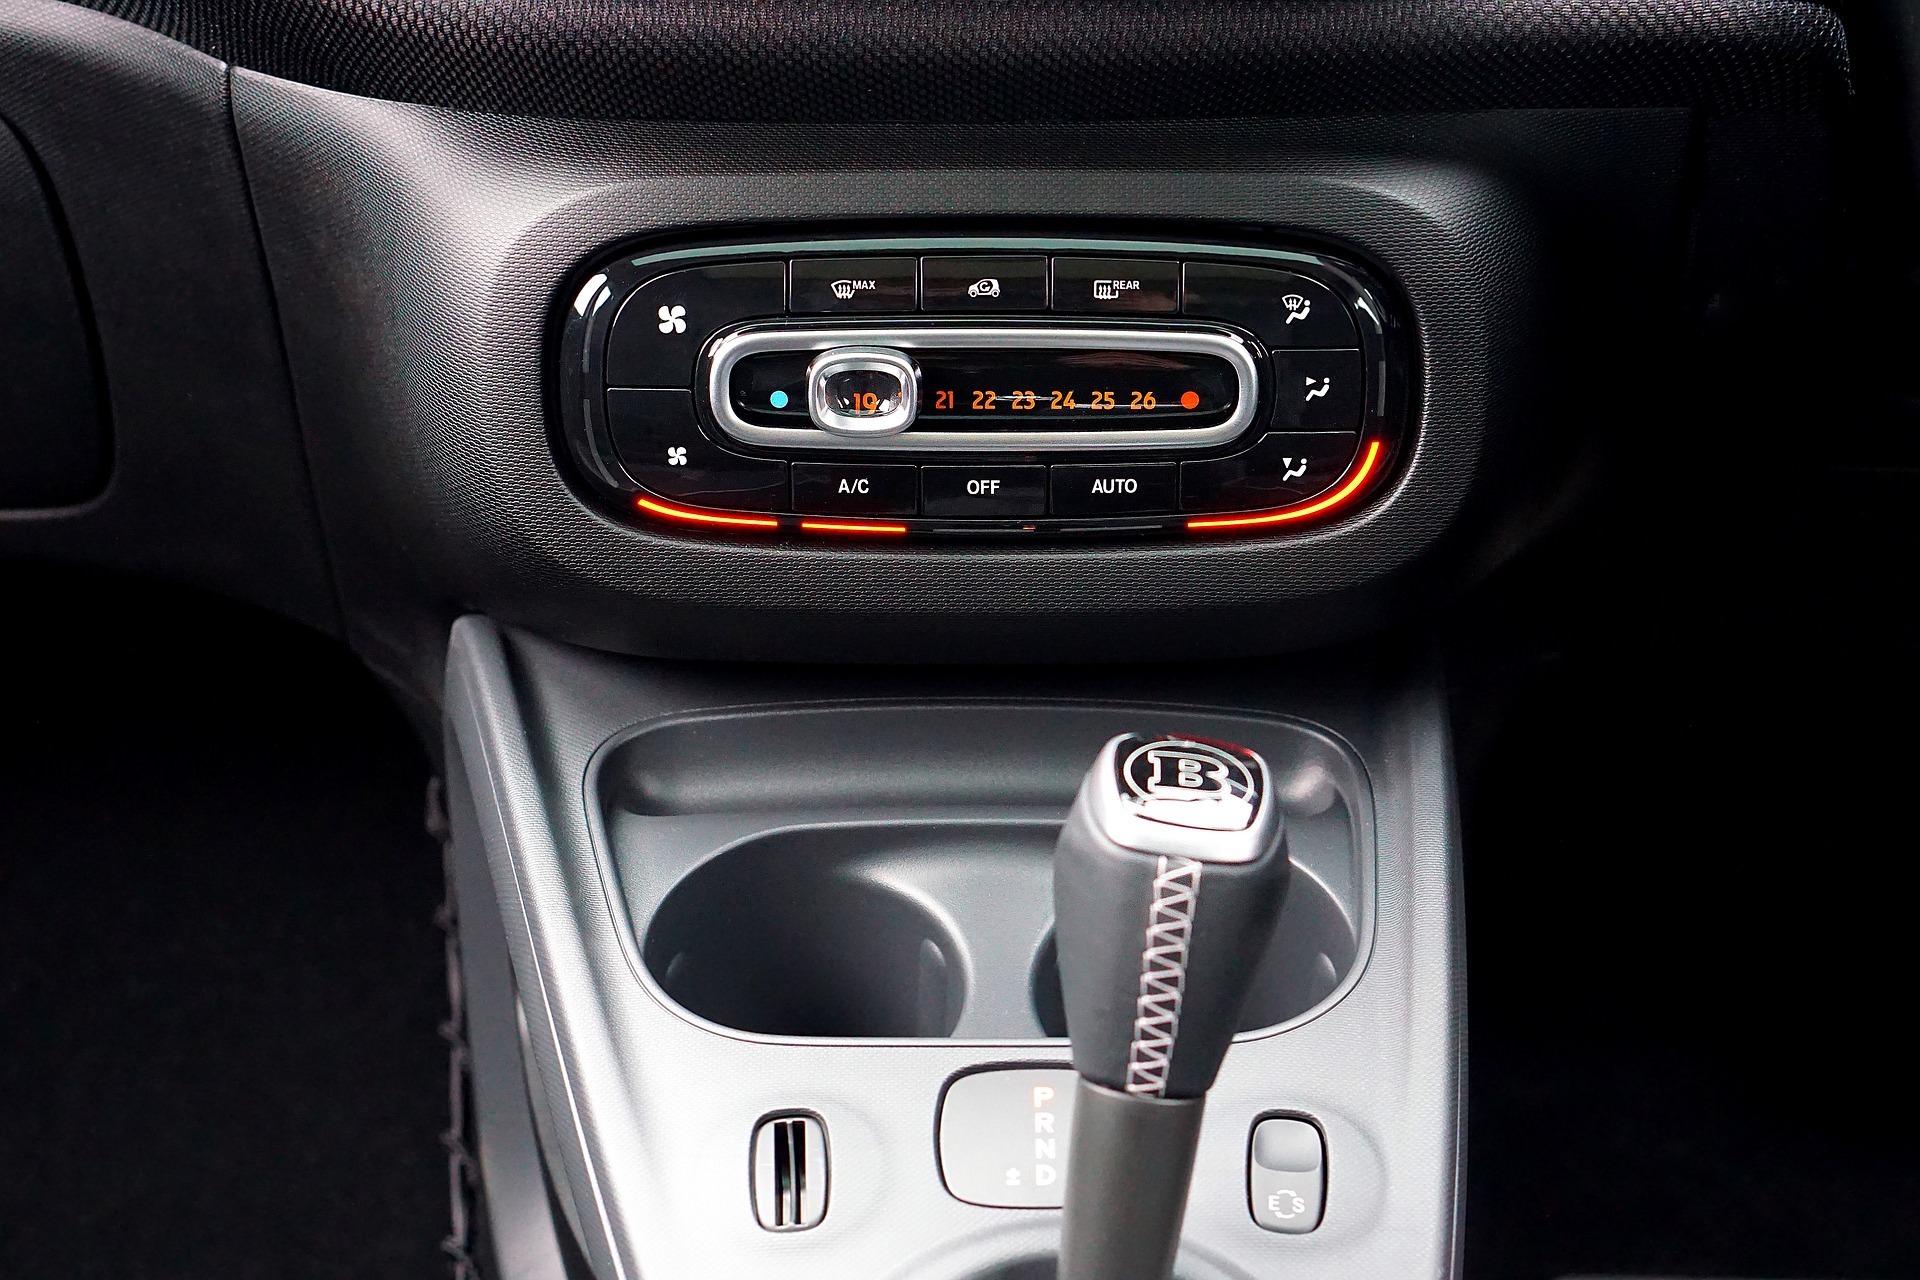 Klima uređaj u automobilu